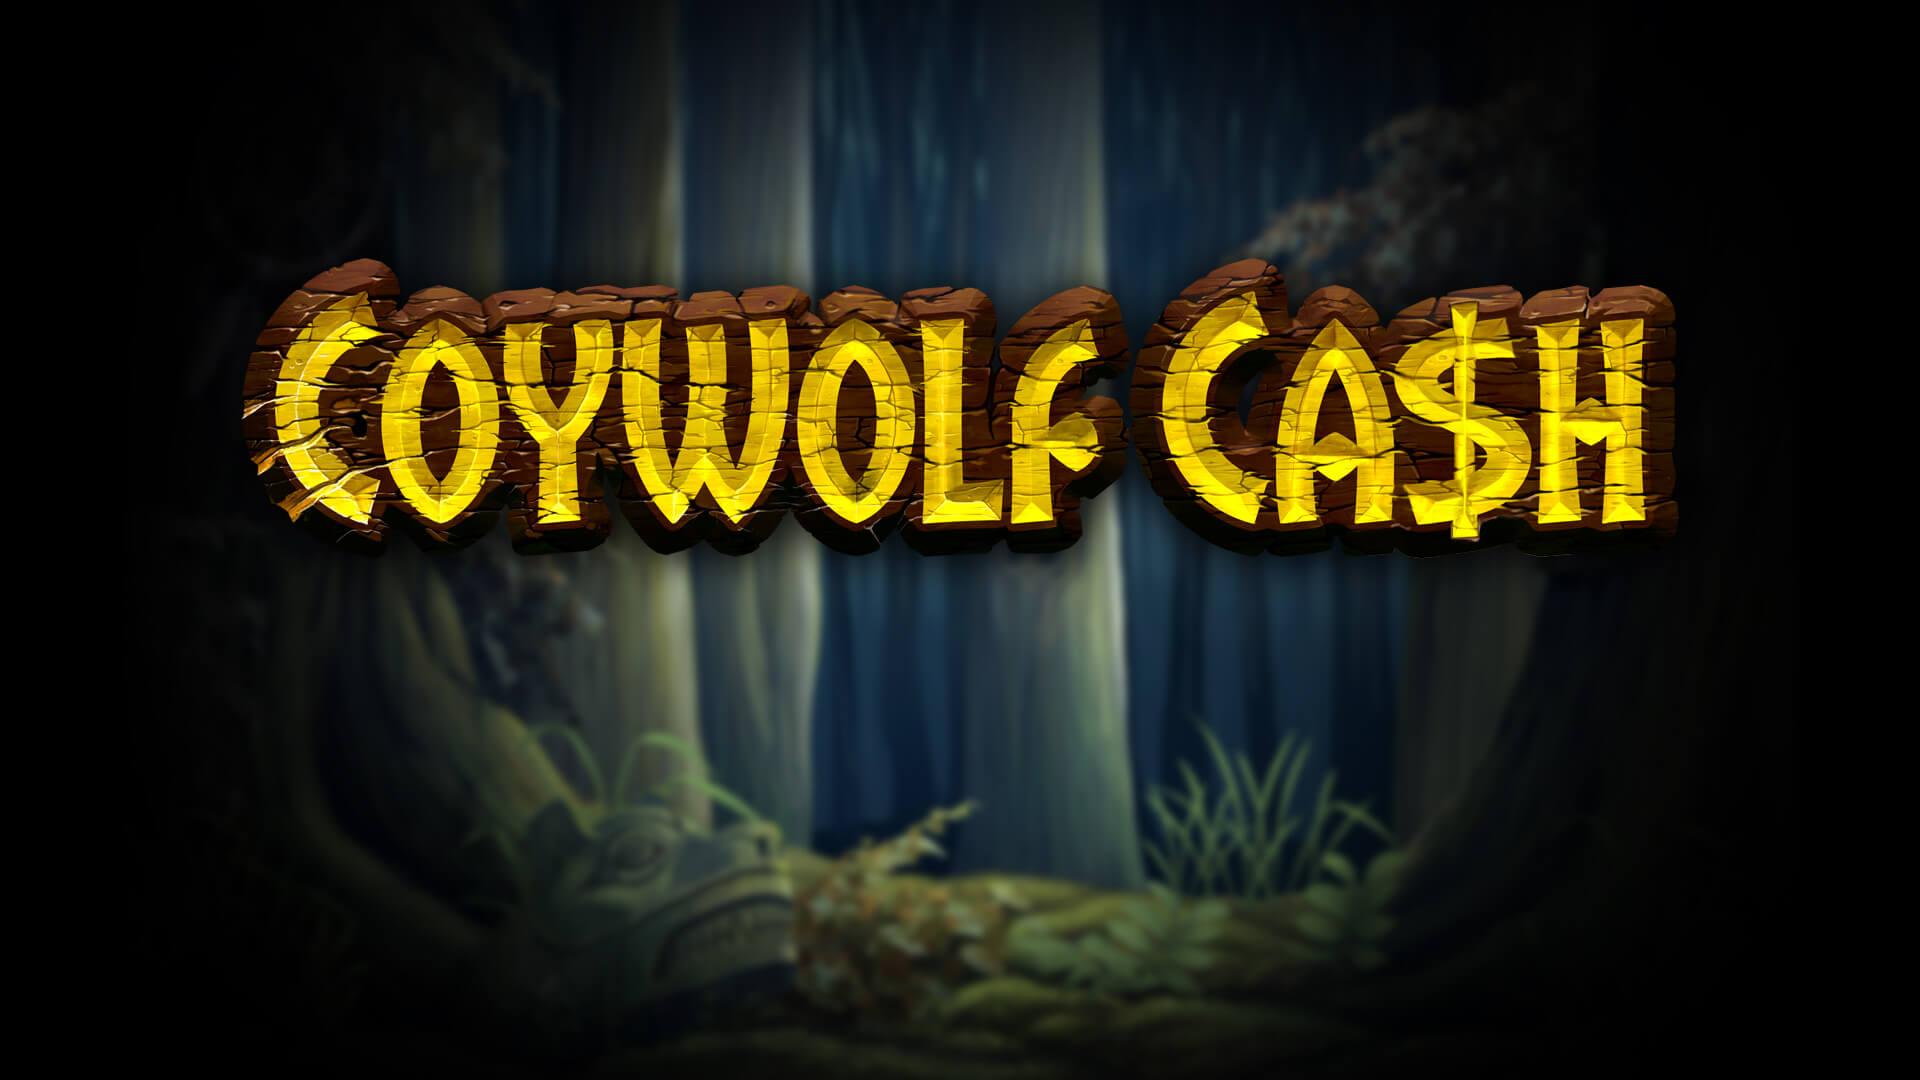 Coywolf Cash (Play'n GO) Slot Review